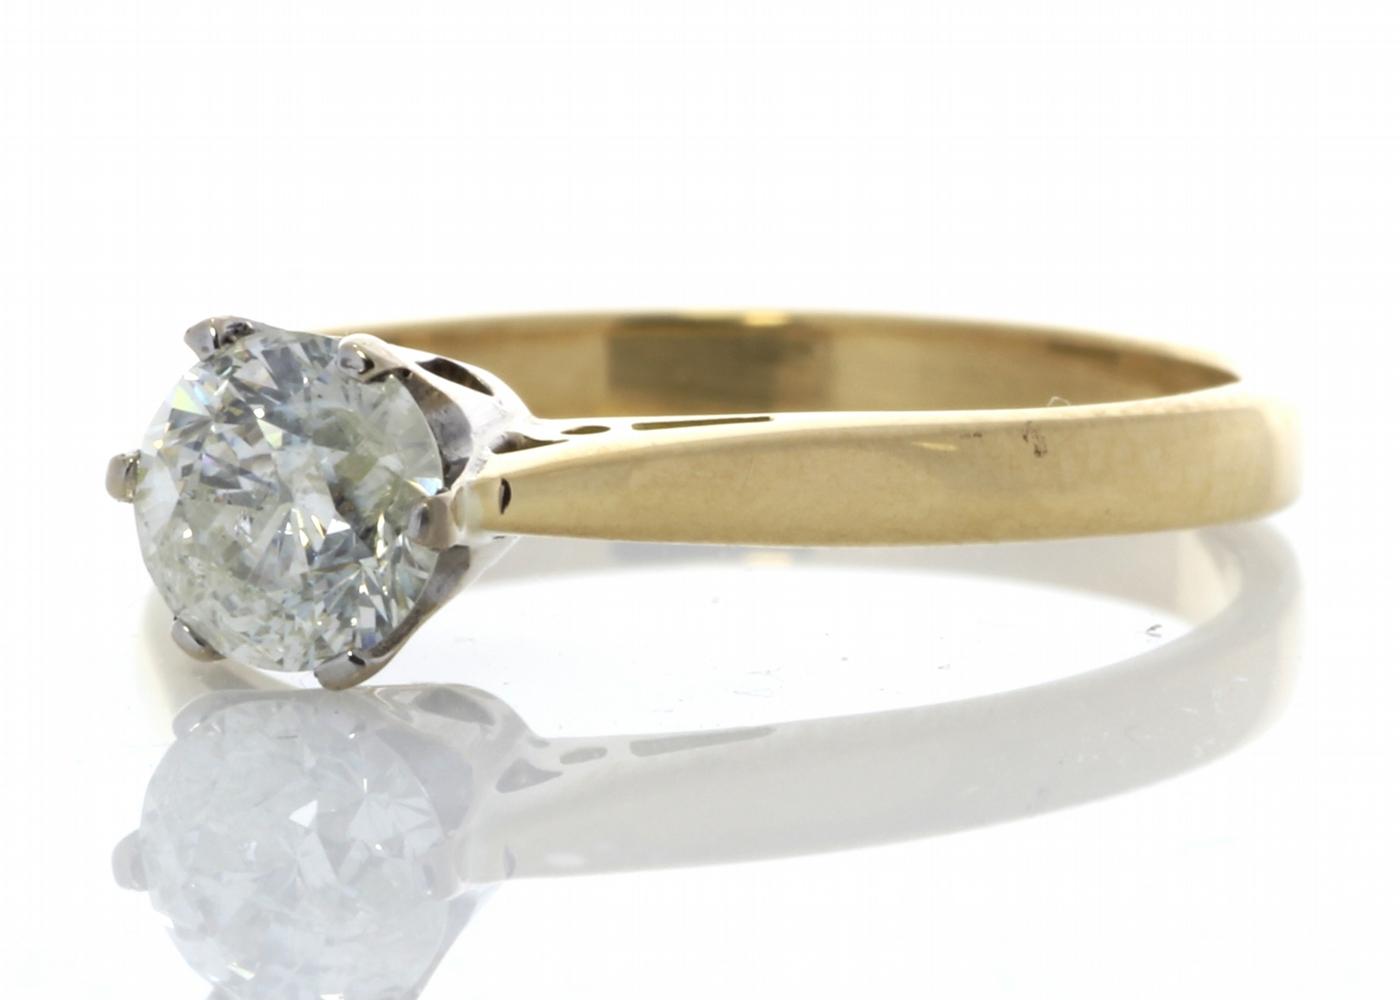 Lot 1 - 18ct Yellow Gold Diamond Engagement Ring 0.61 Carats